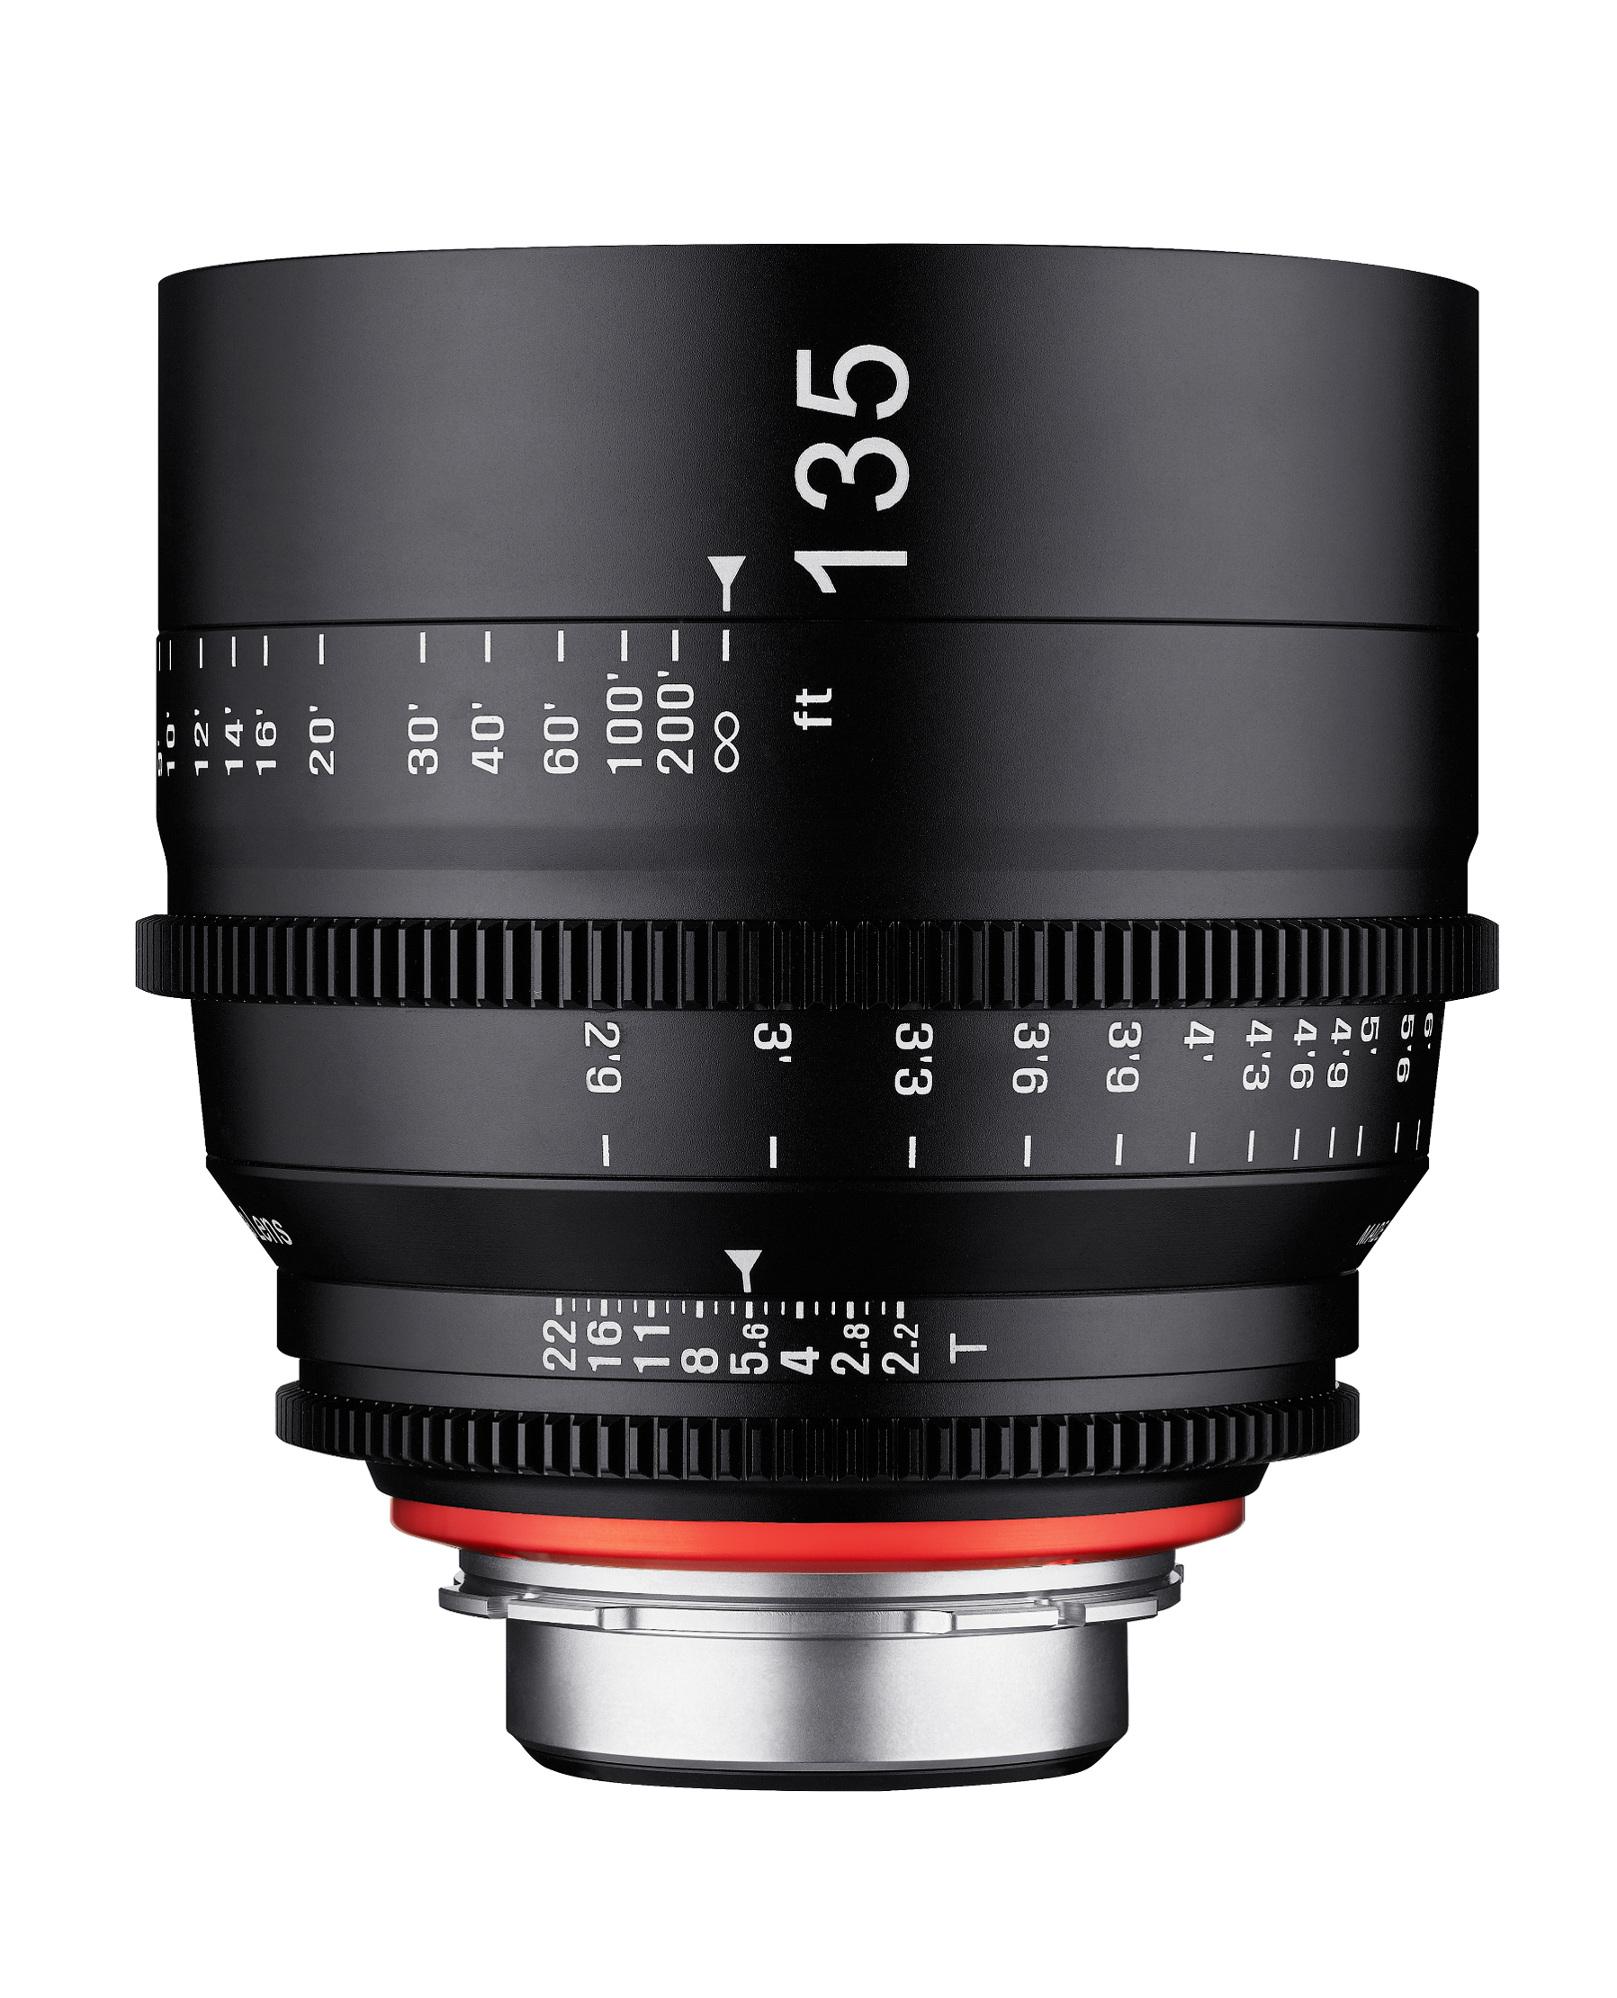 Professional Cine Lens